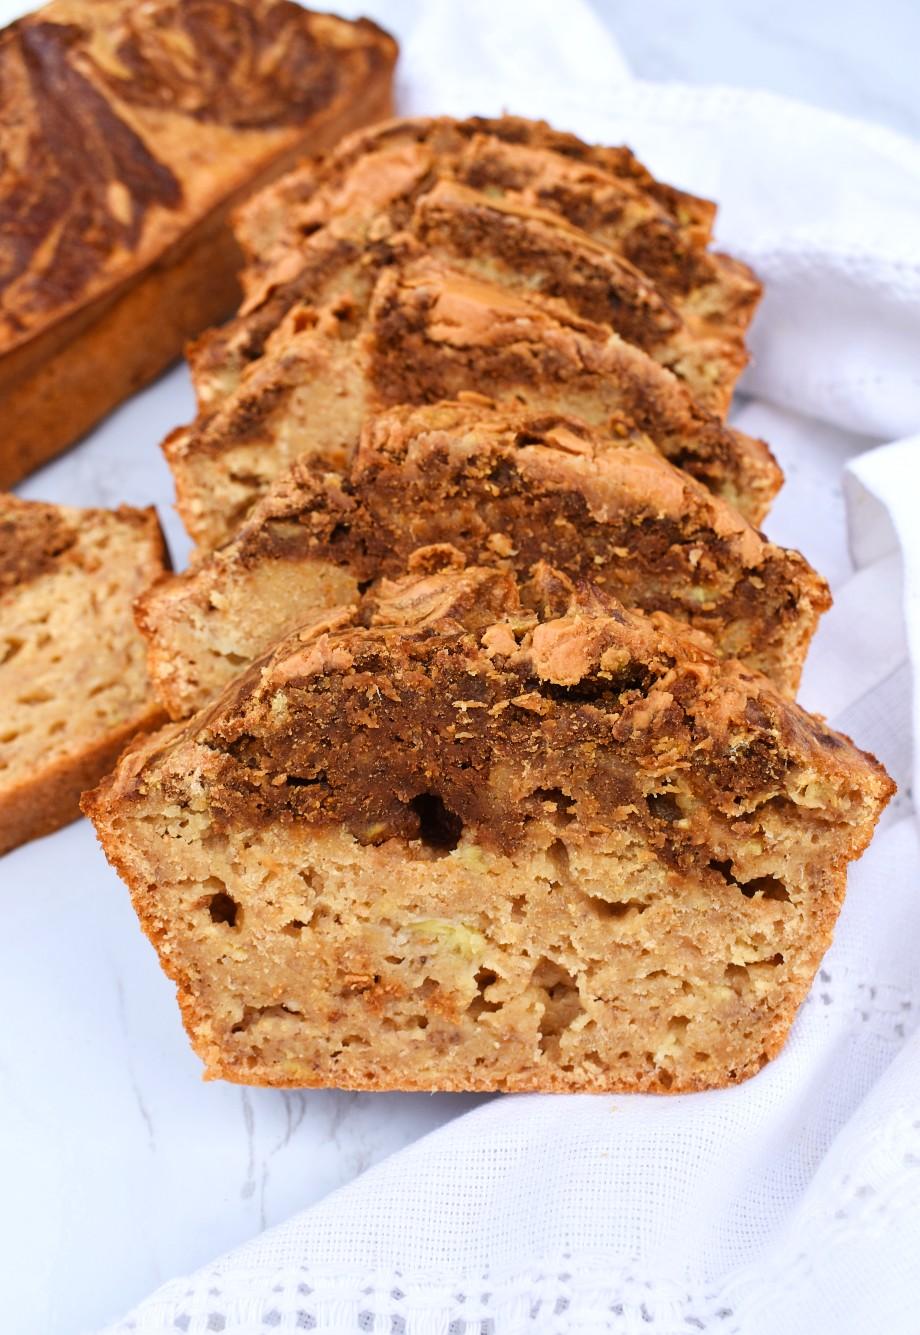 Swirled Chocolate Peanut Butter Banana Bread